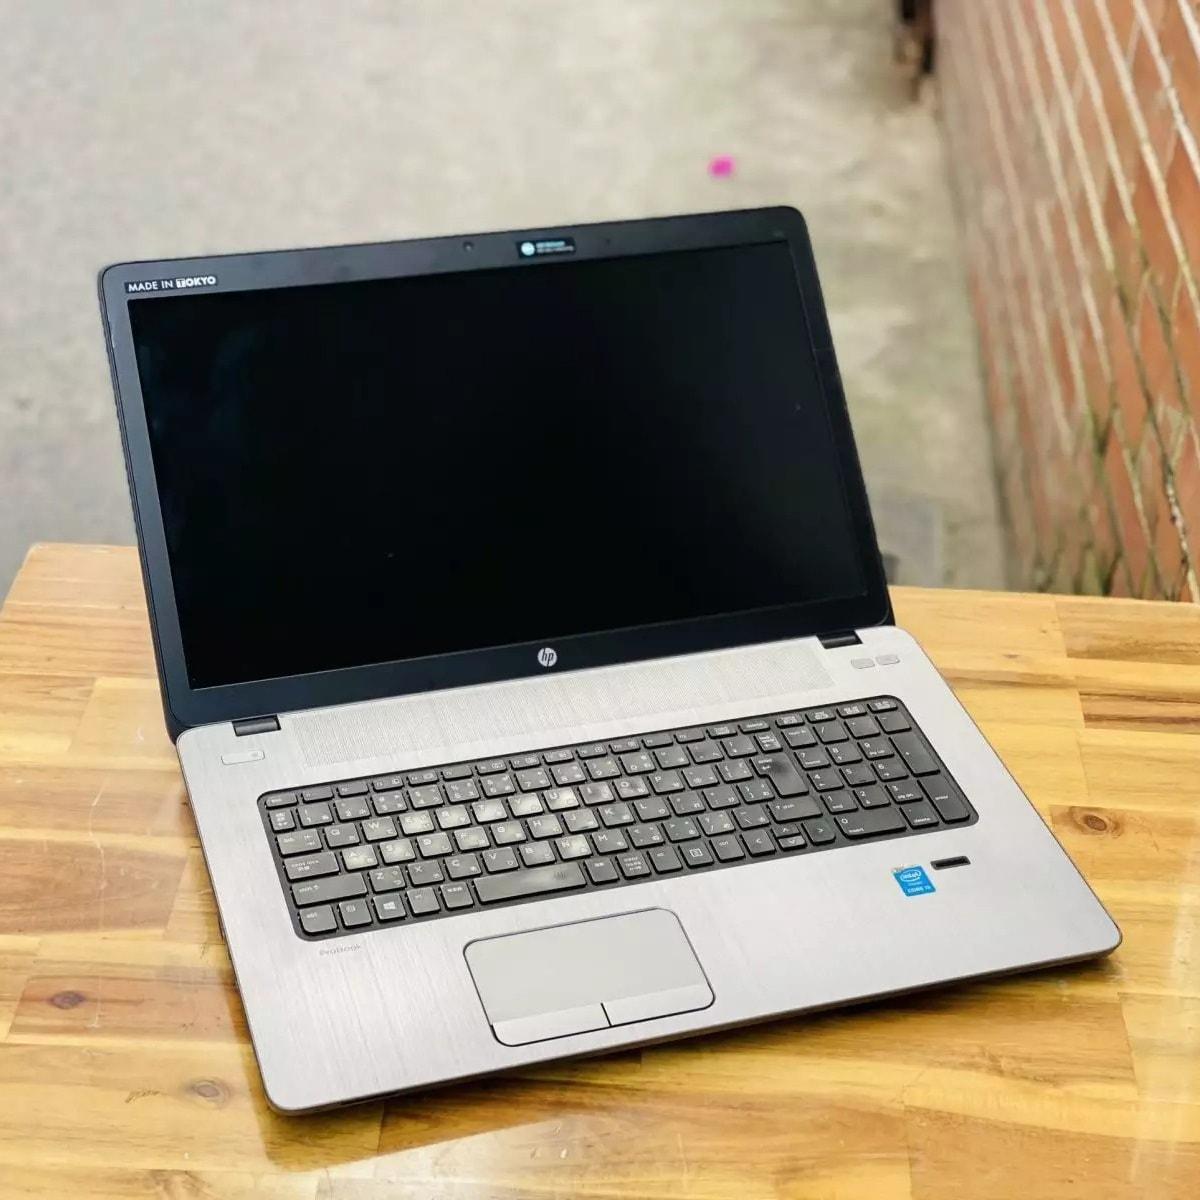 HP Probook 470 G1 Core i5 4200M, Ram 4GB, SSD 120GB, 17.3 Inch, AMD Radeon HD 8750M